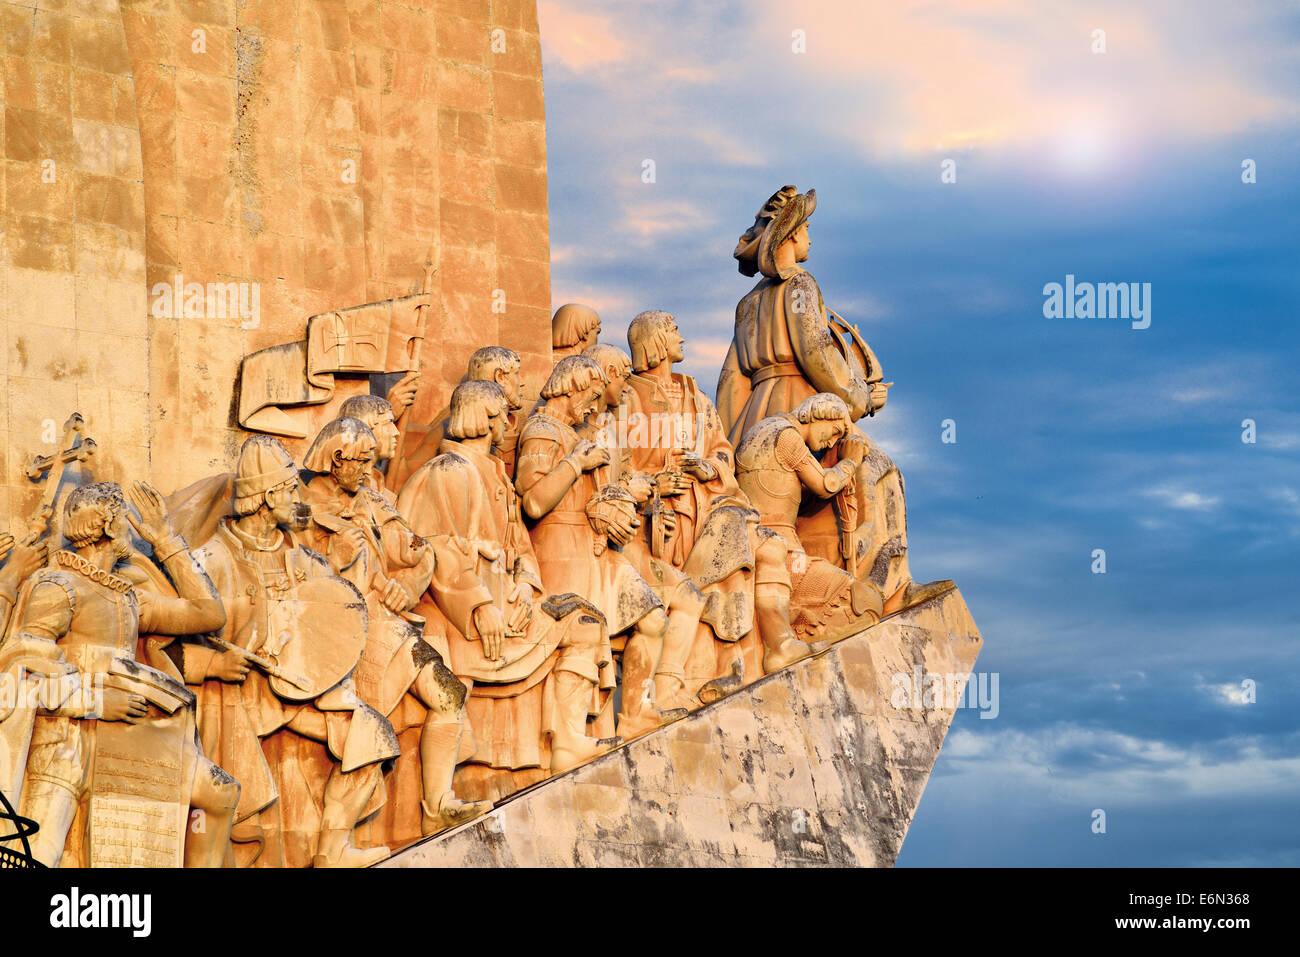 Portugal, Lissabon: Detail des Denkmals Entdeckungen mit bewölktem Himmel Stockbild